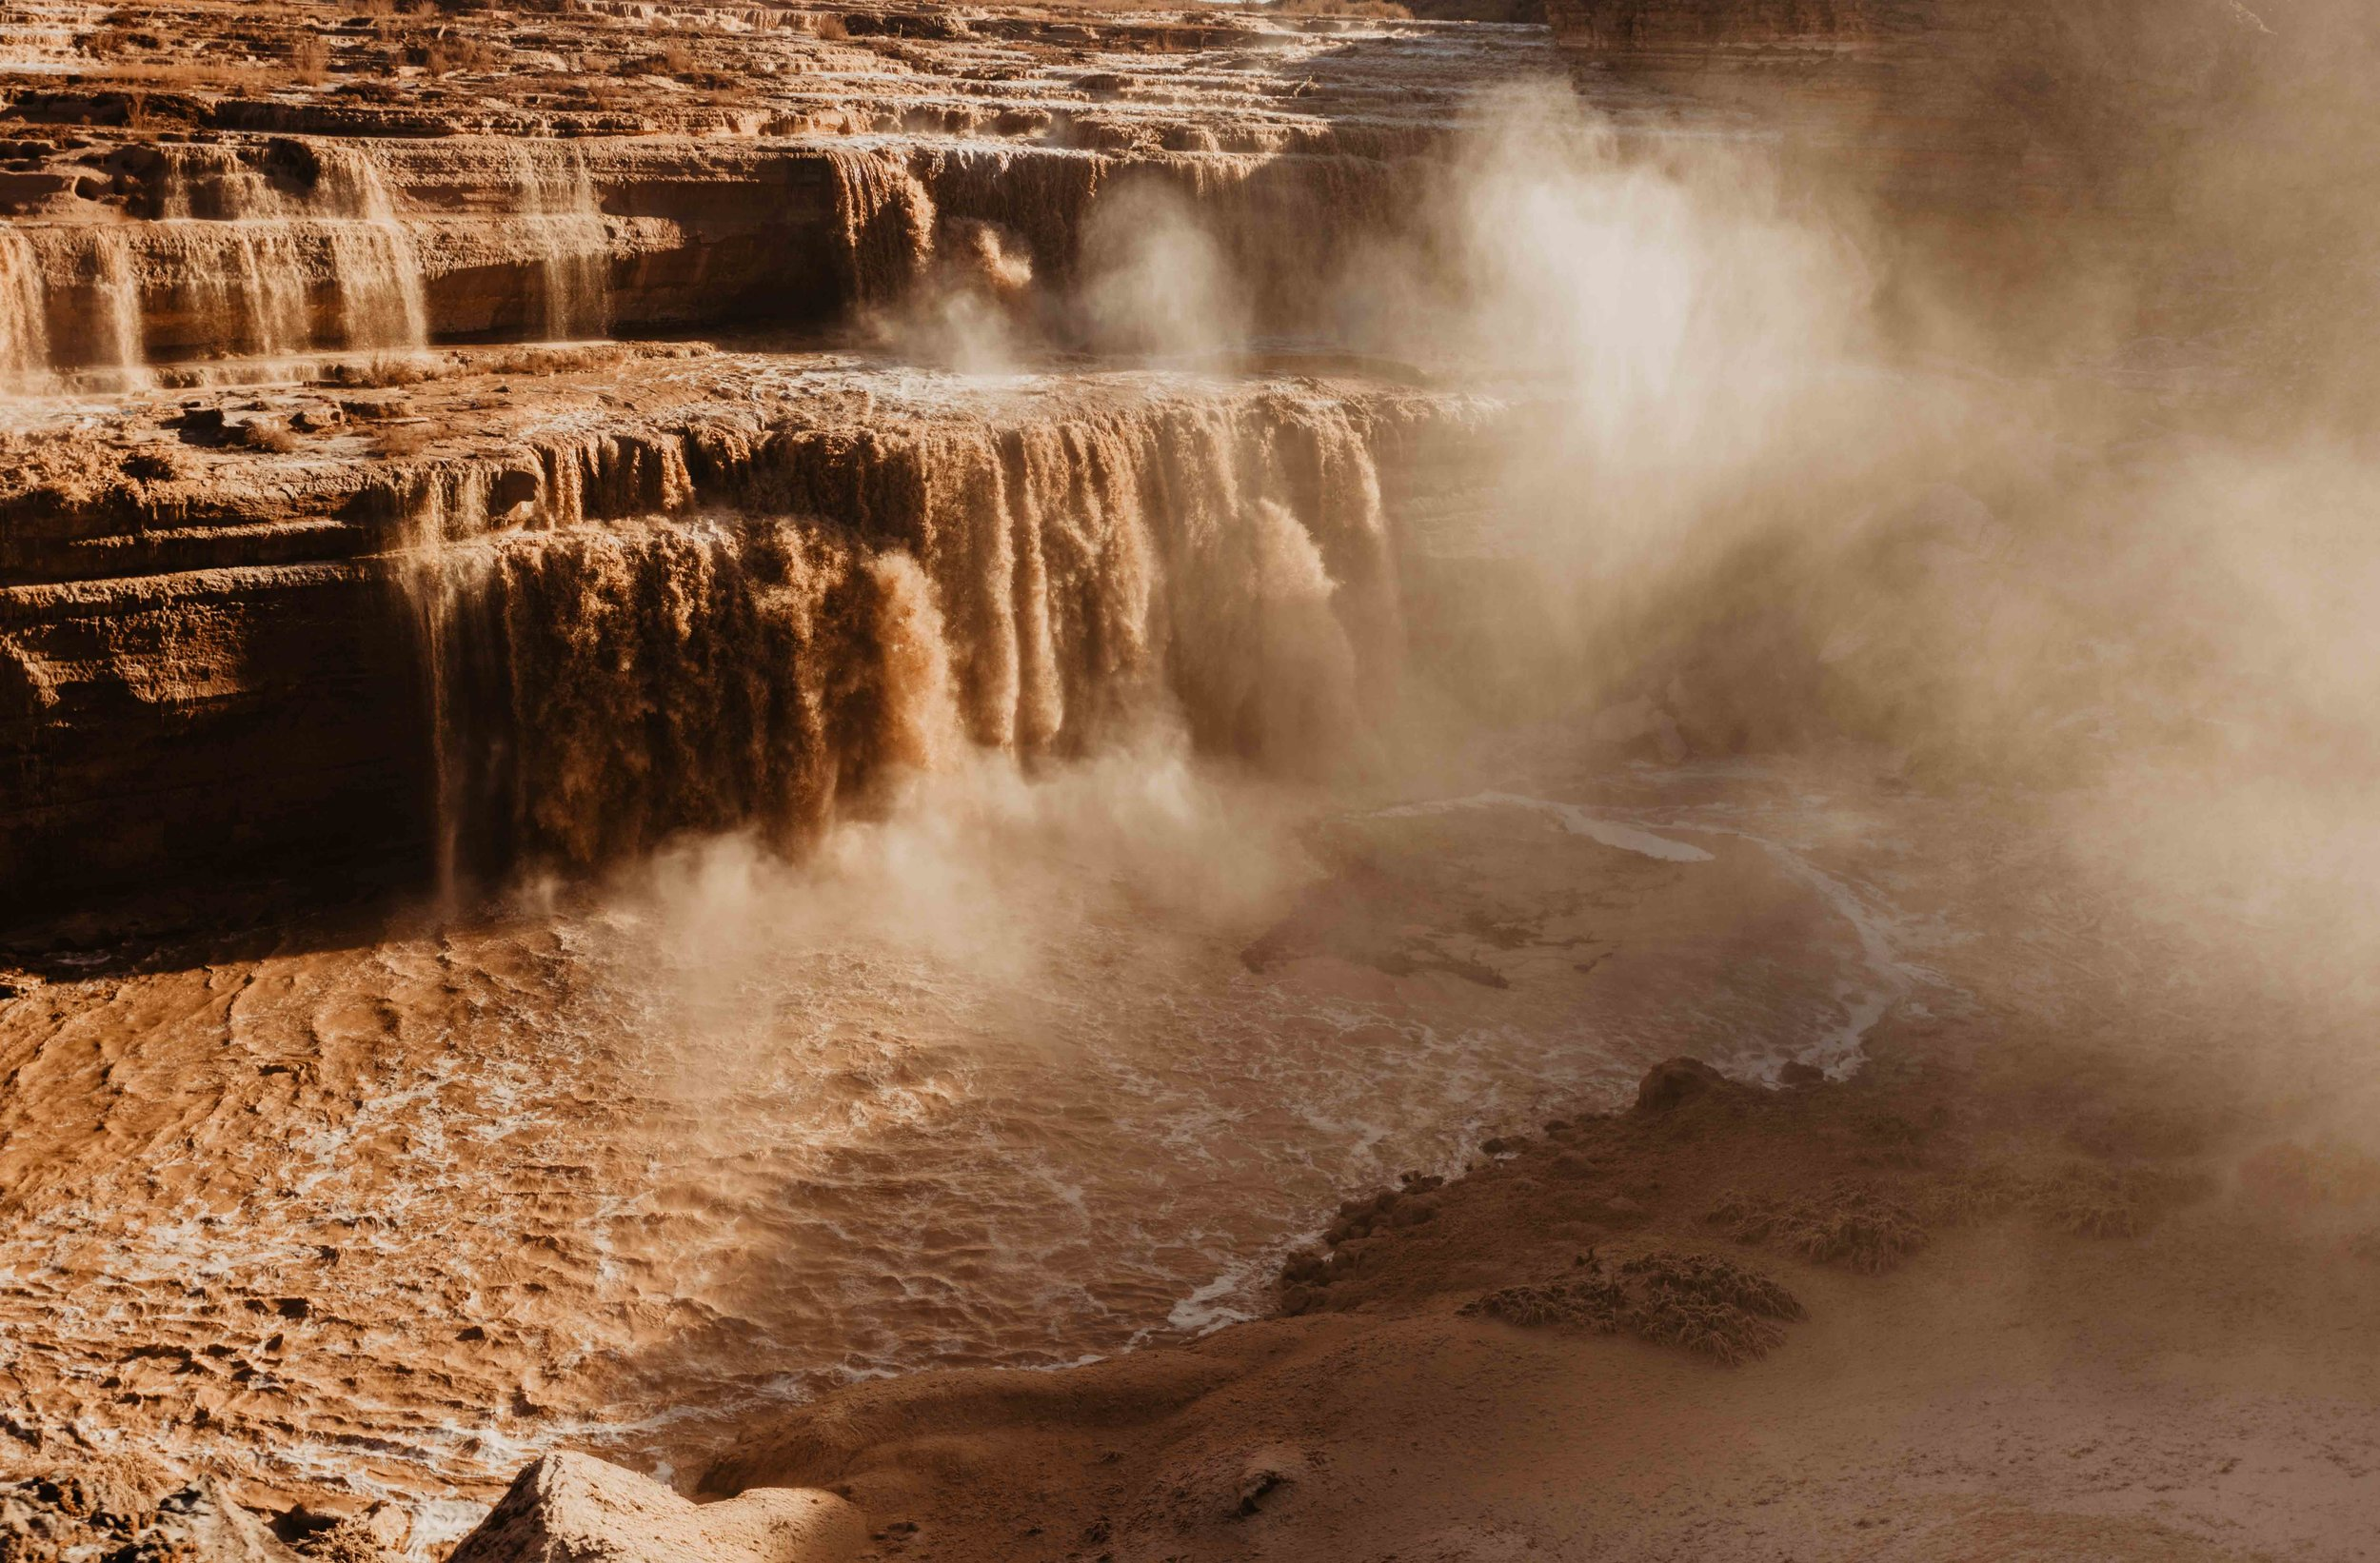 Flagstaff Elopement Photographer - Flagstaff Elopement Locations - Grand Falls in Arizona - Arizona Elopement Photographer